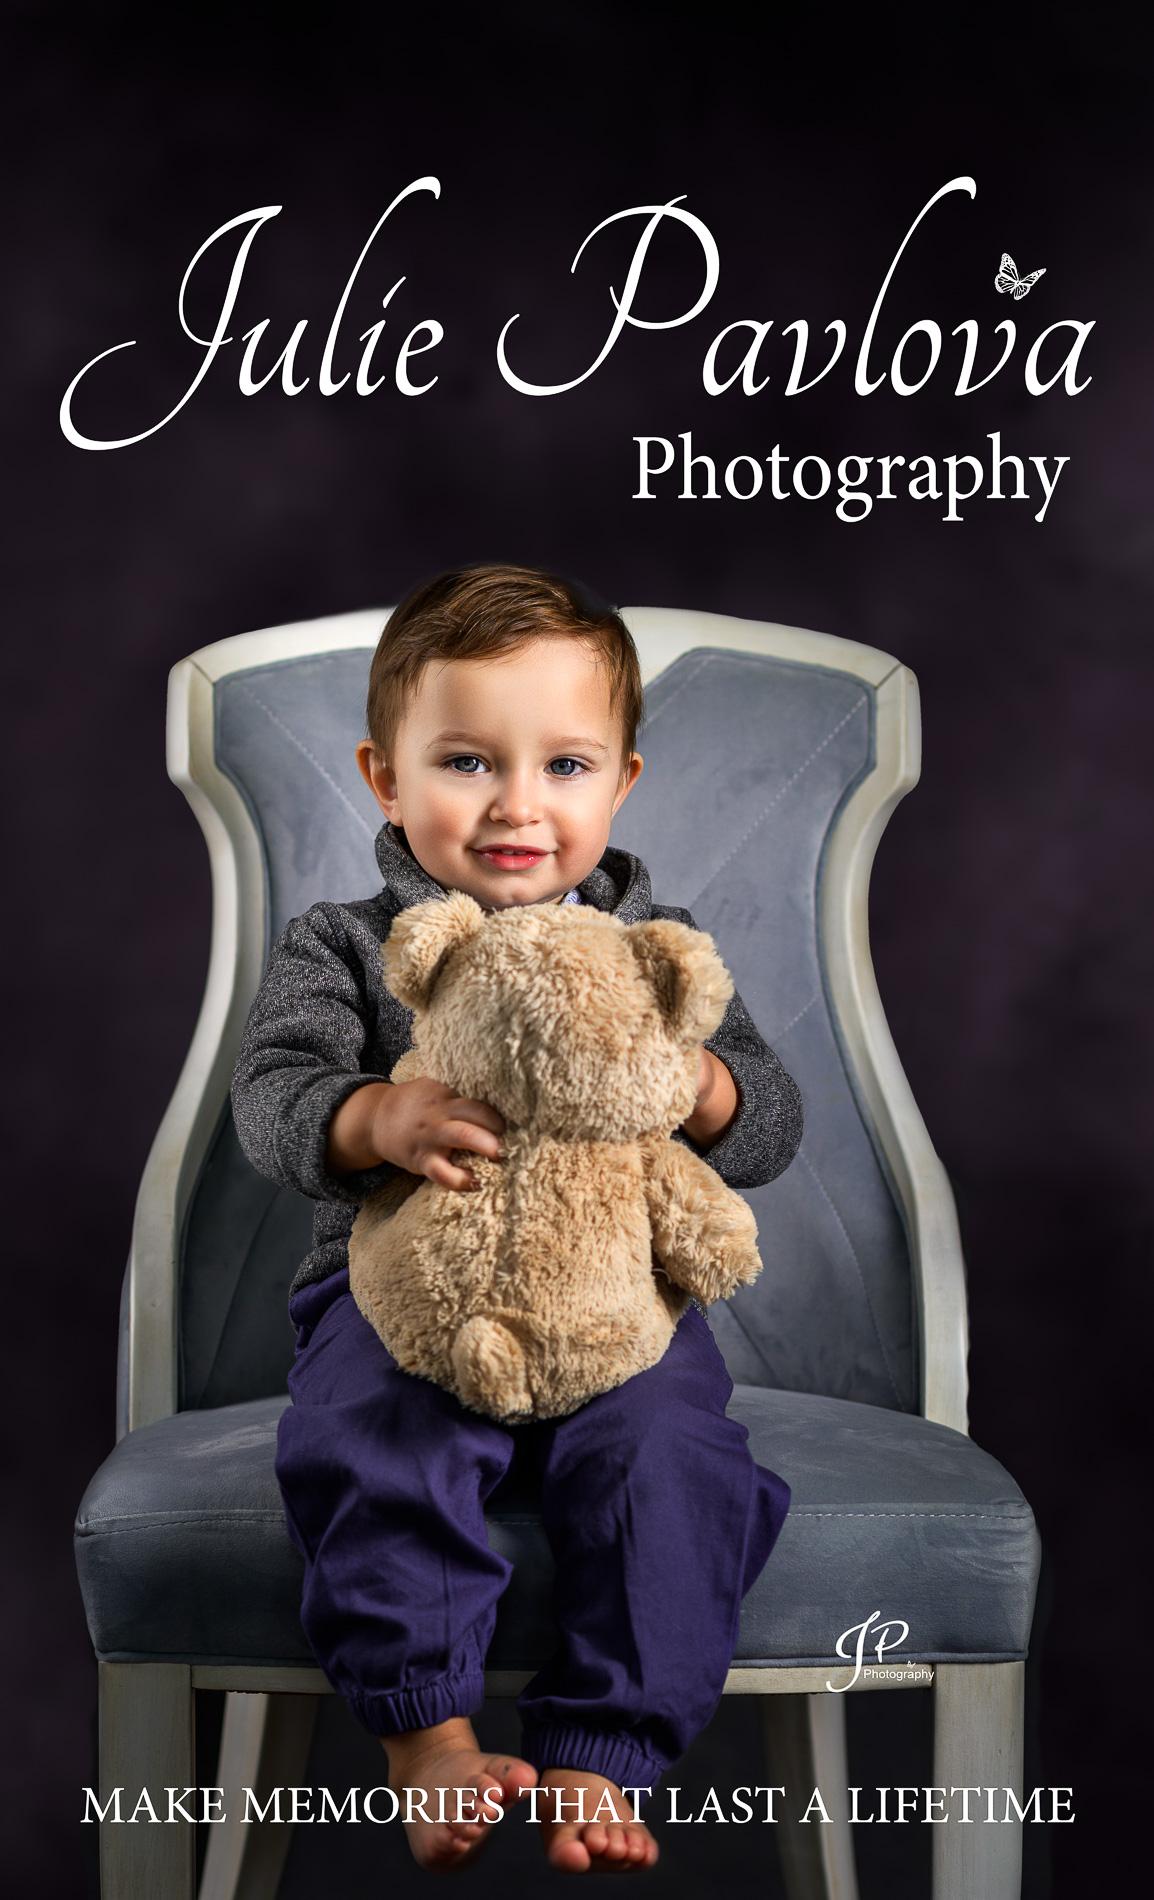 Fine Art Kid's Portrait by New Jersey professional photographer Julie Pavlova Photography, top 20 Best New York Photographers (Bergen County, NJ)